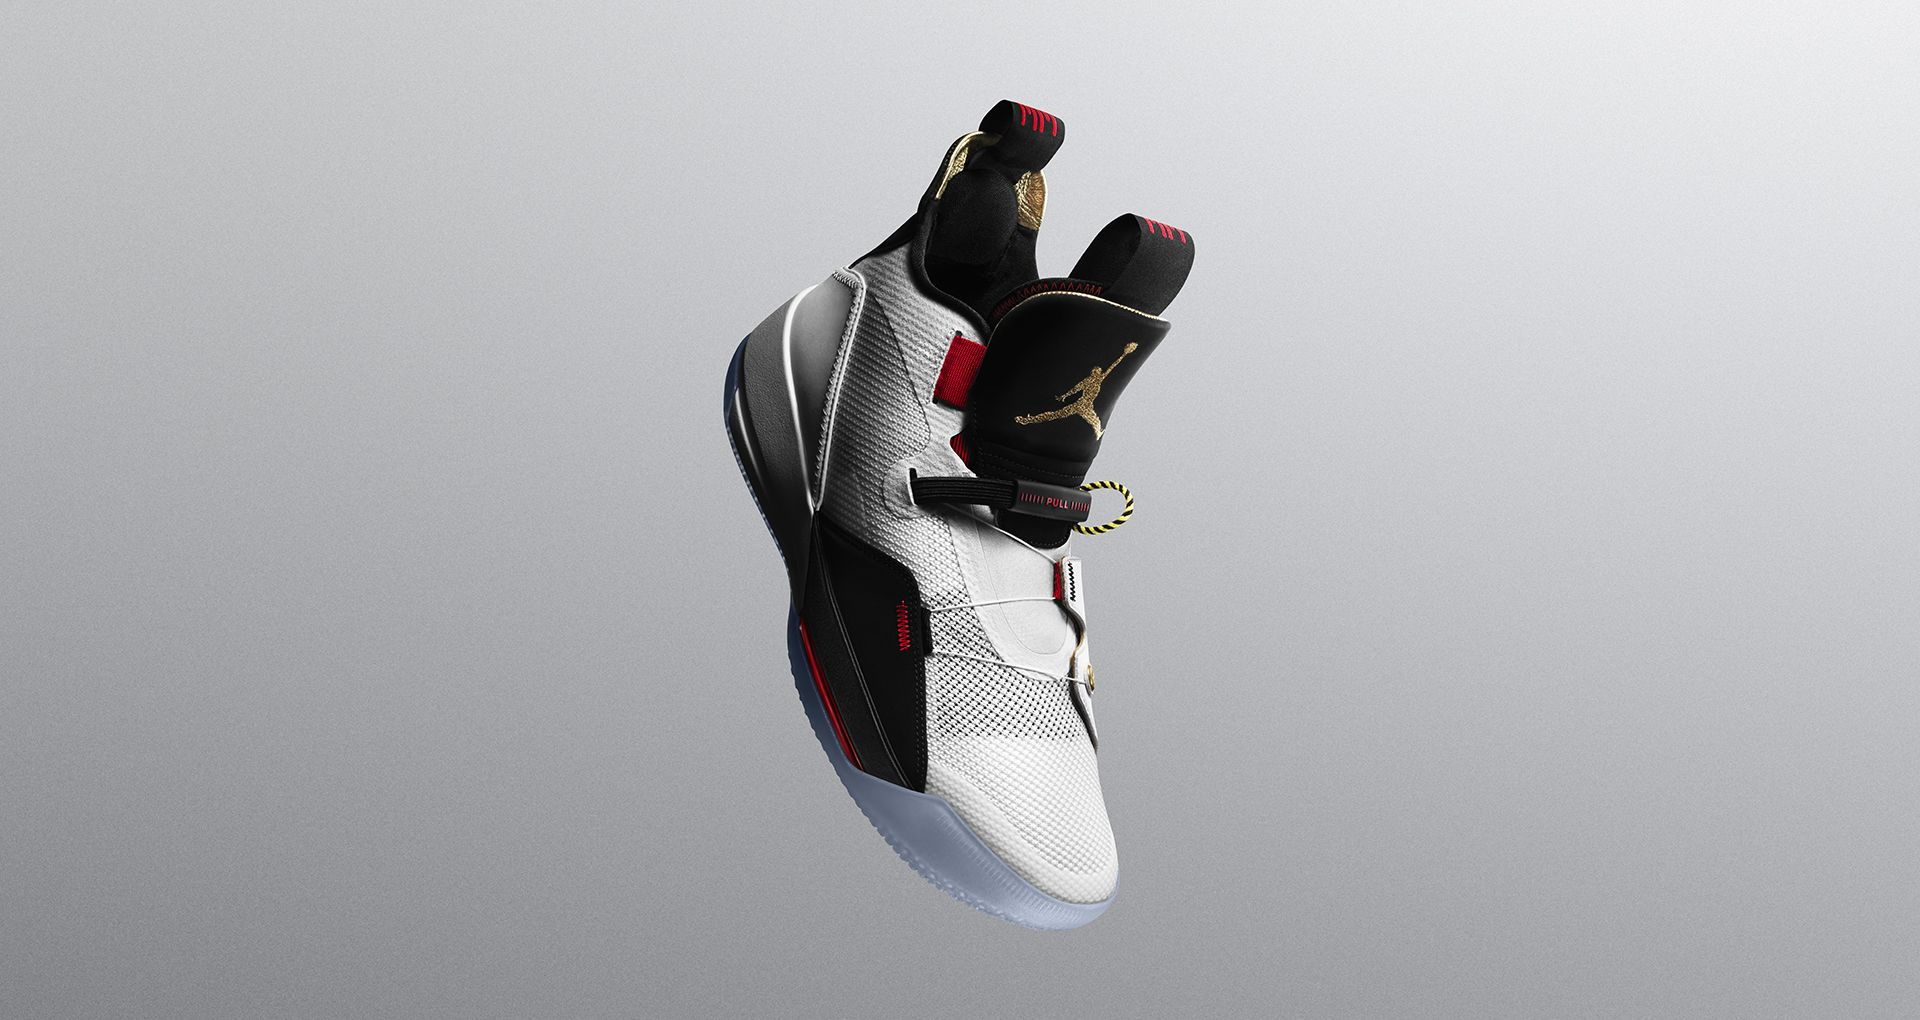 7bd7a5f9c074c8 Air Jordan 33  Future Flight  Release Date. Nike+ SNKRS